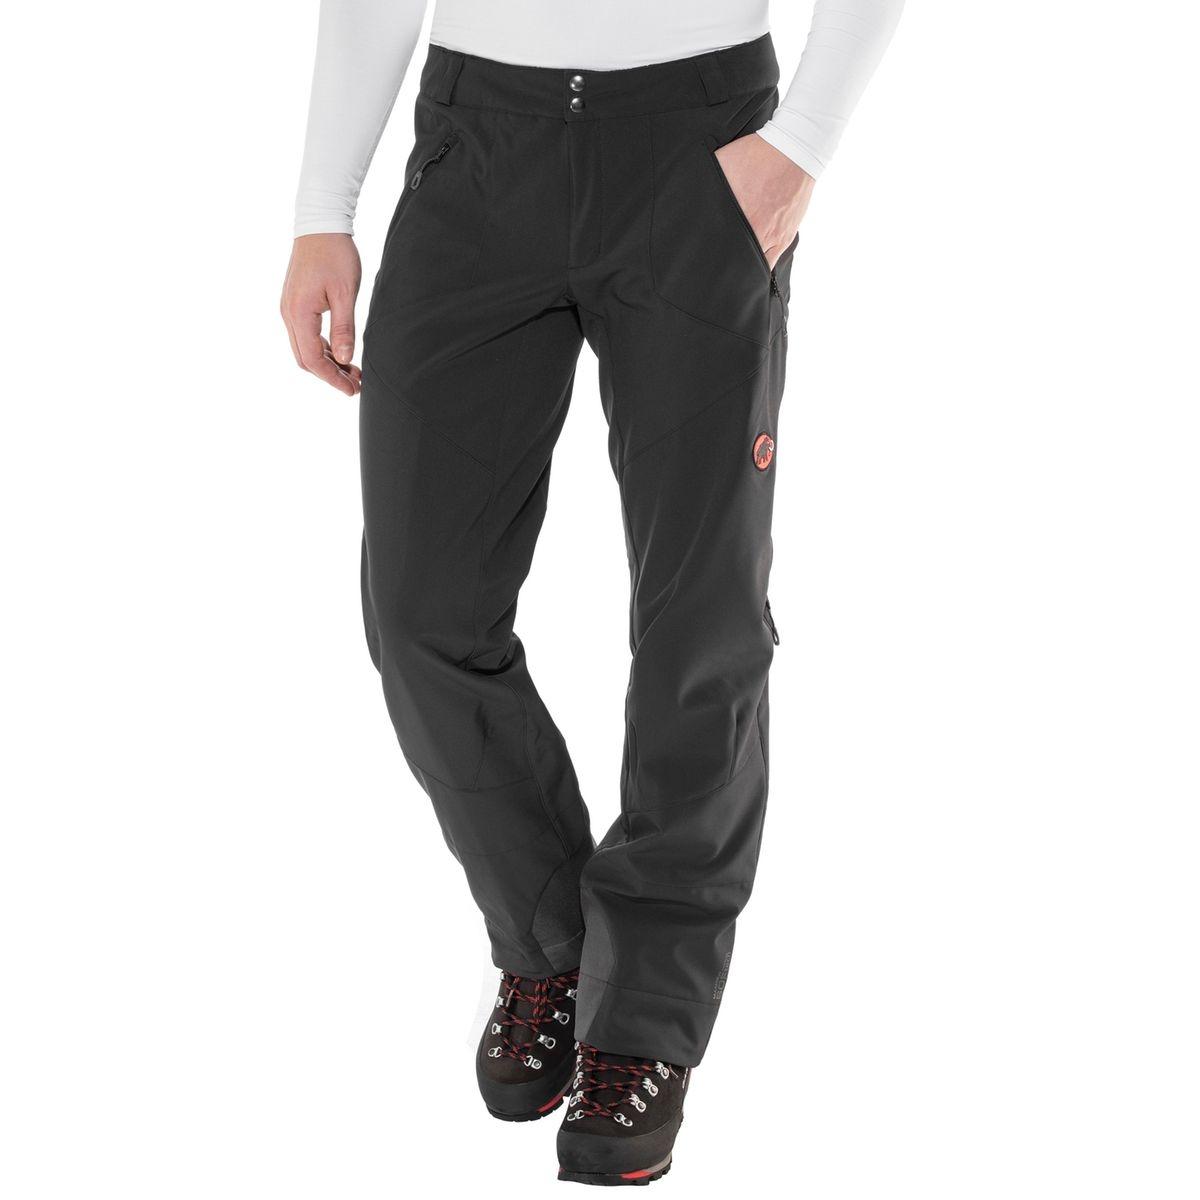 Tatramar SO - Pantalon long Homme - noir